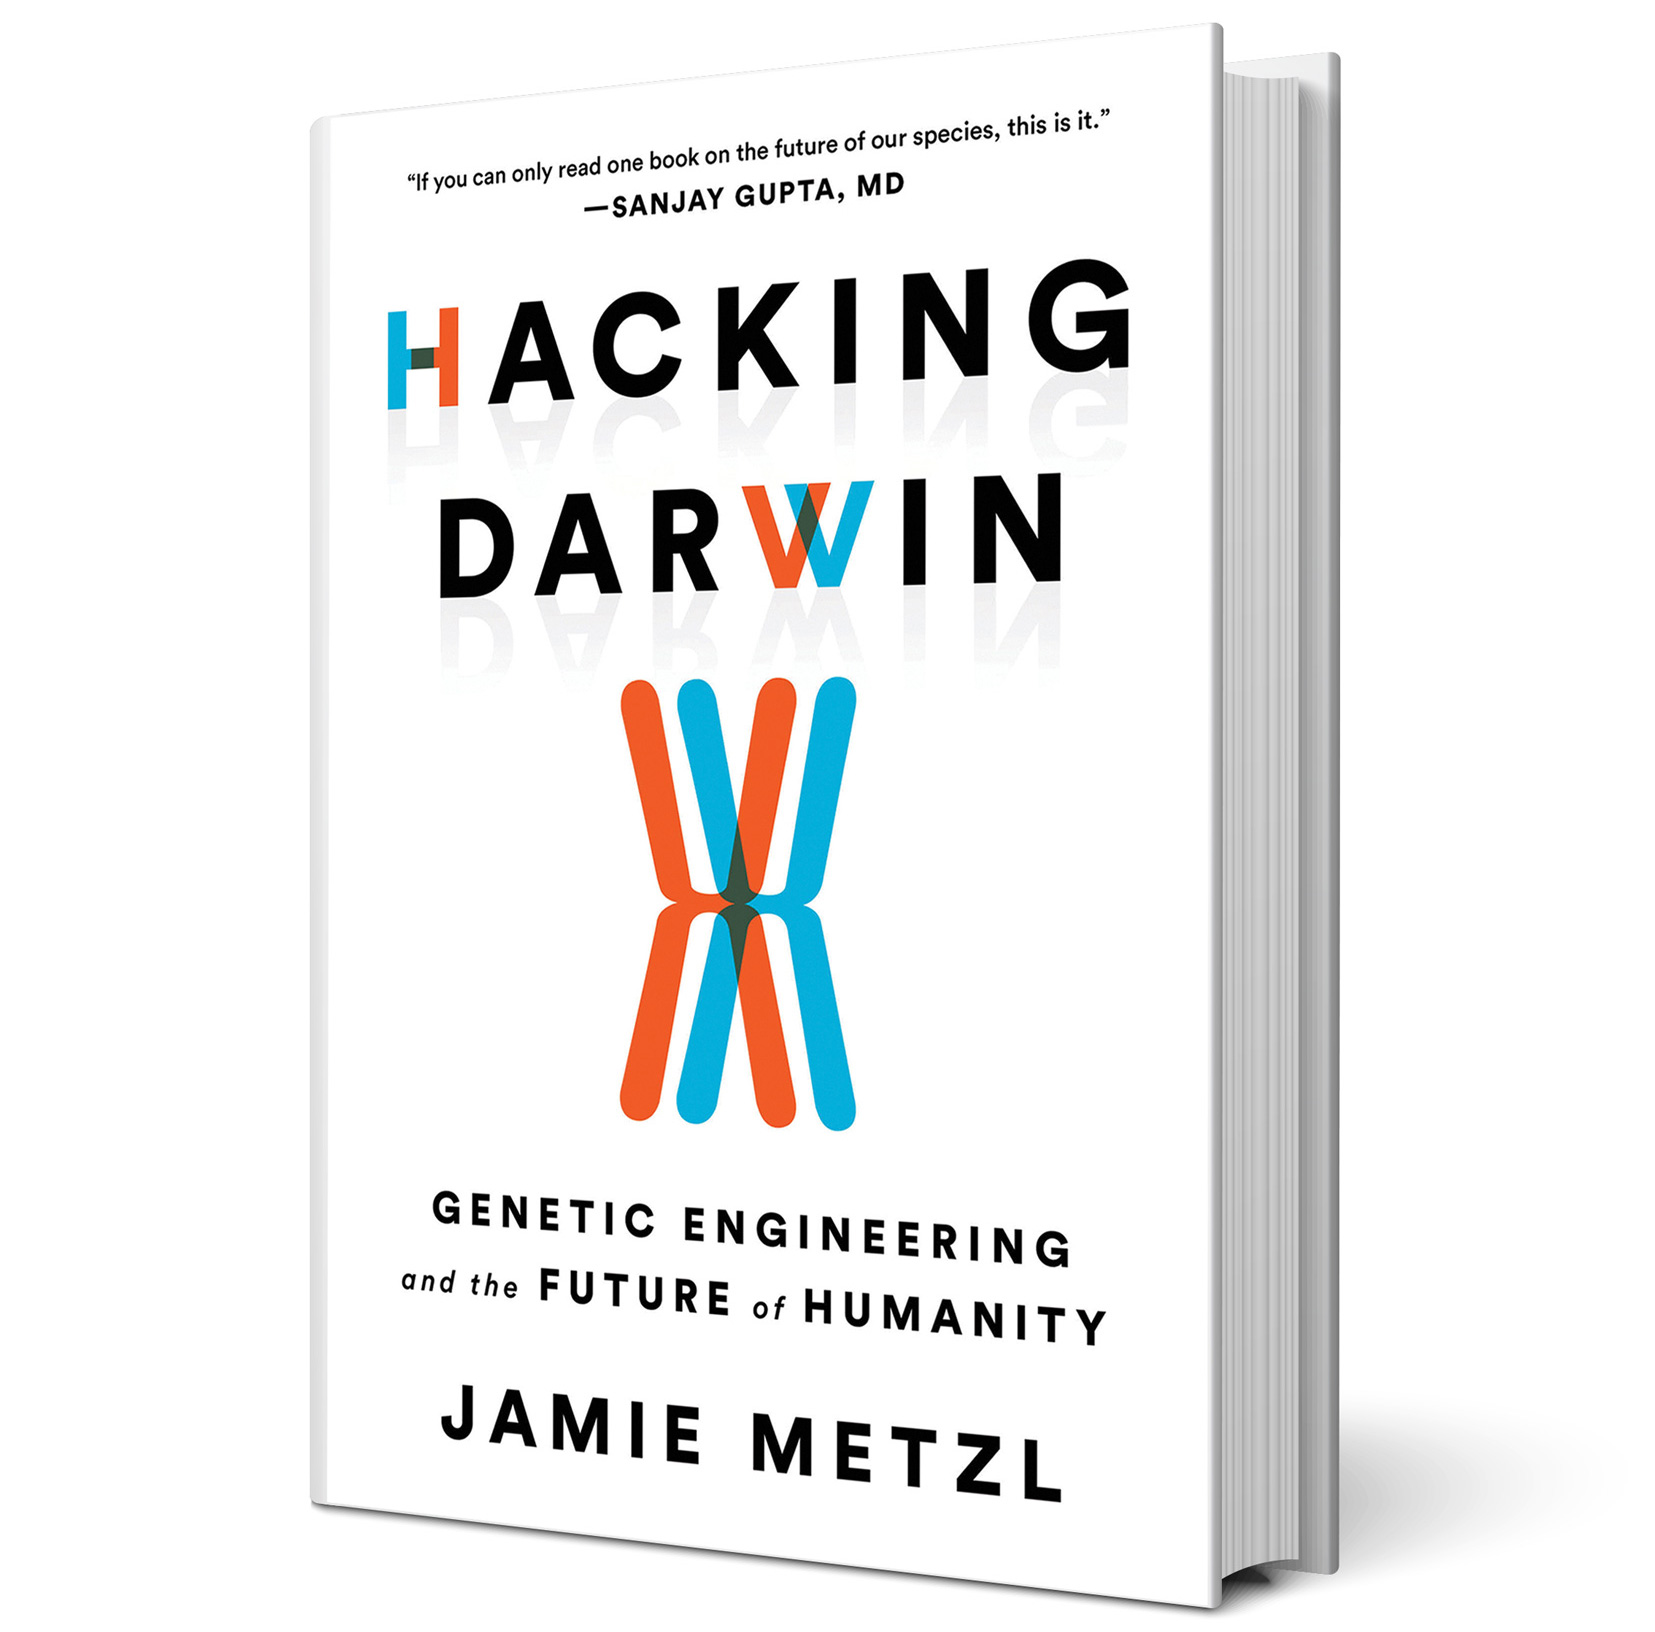 Hacking Darwin: Genetic Engineering and the Future of Humanity, by Jamie Metzl